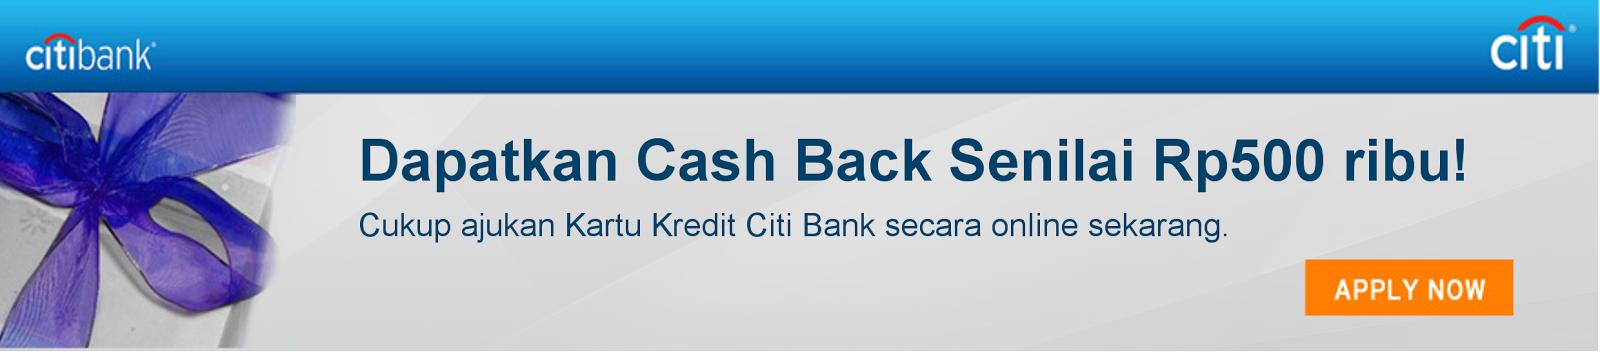 Daftar Kartu Kredit Citibank Online, Promo Kartu Kredit Citibank